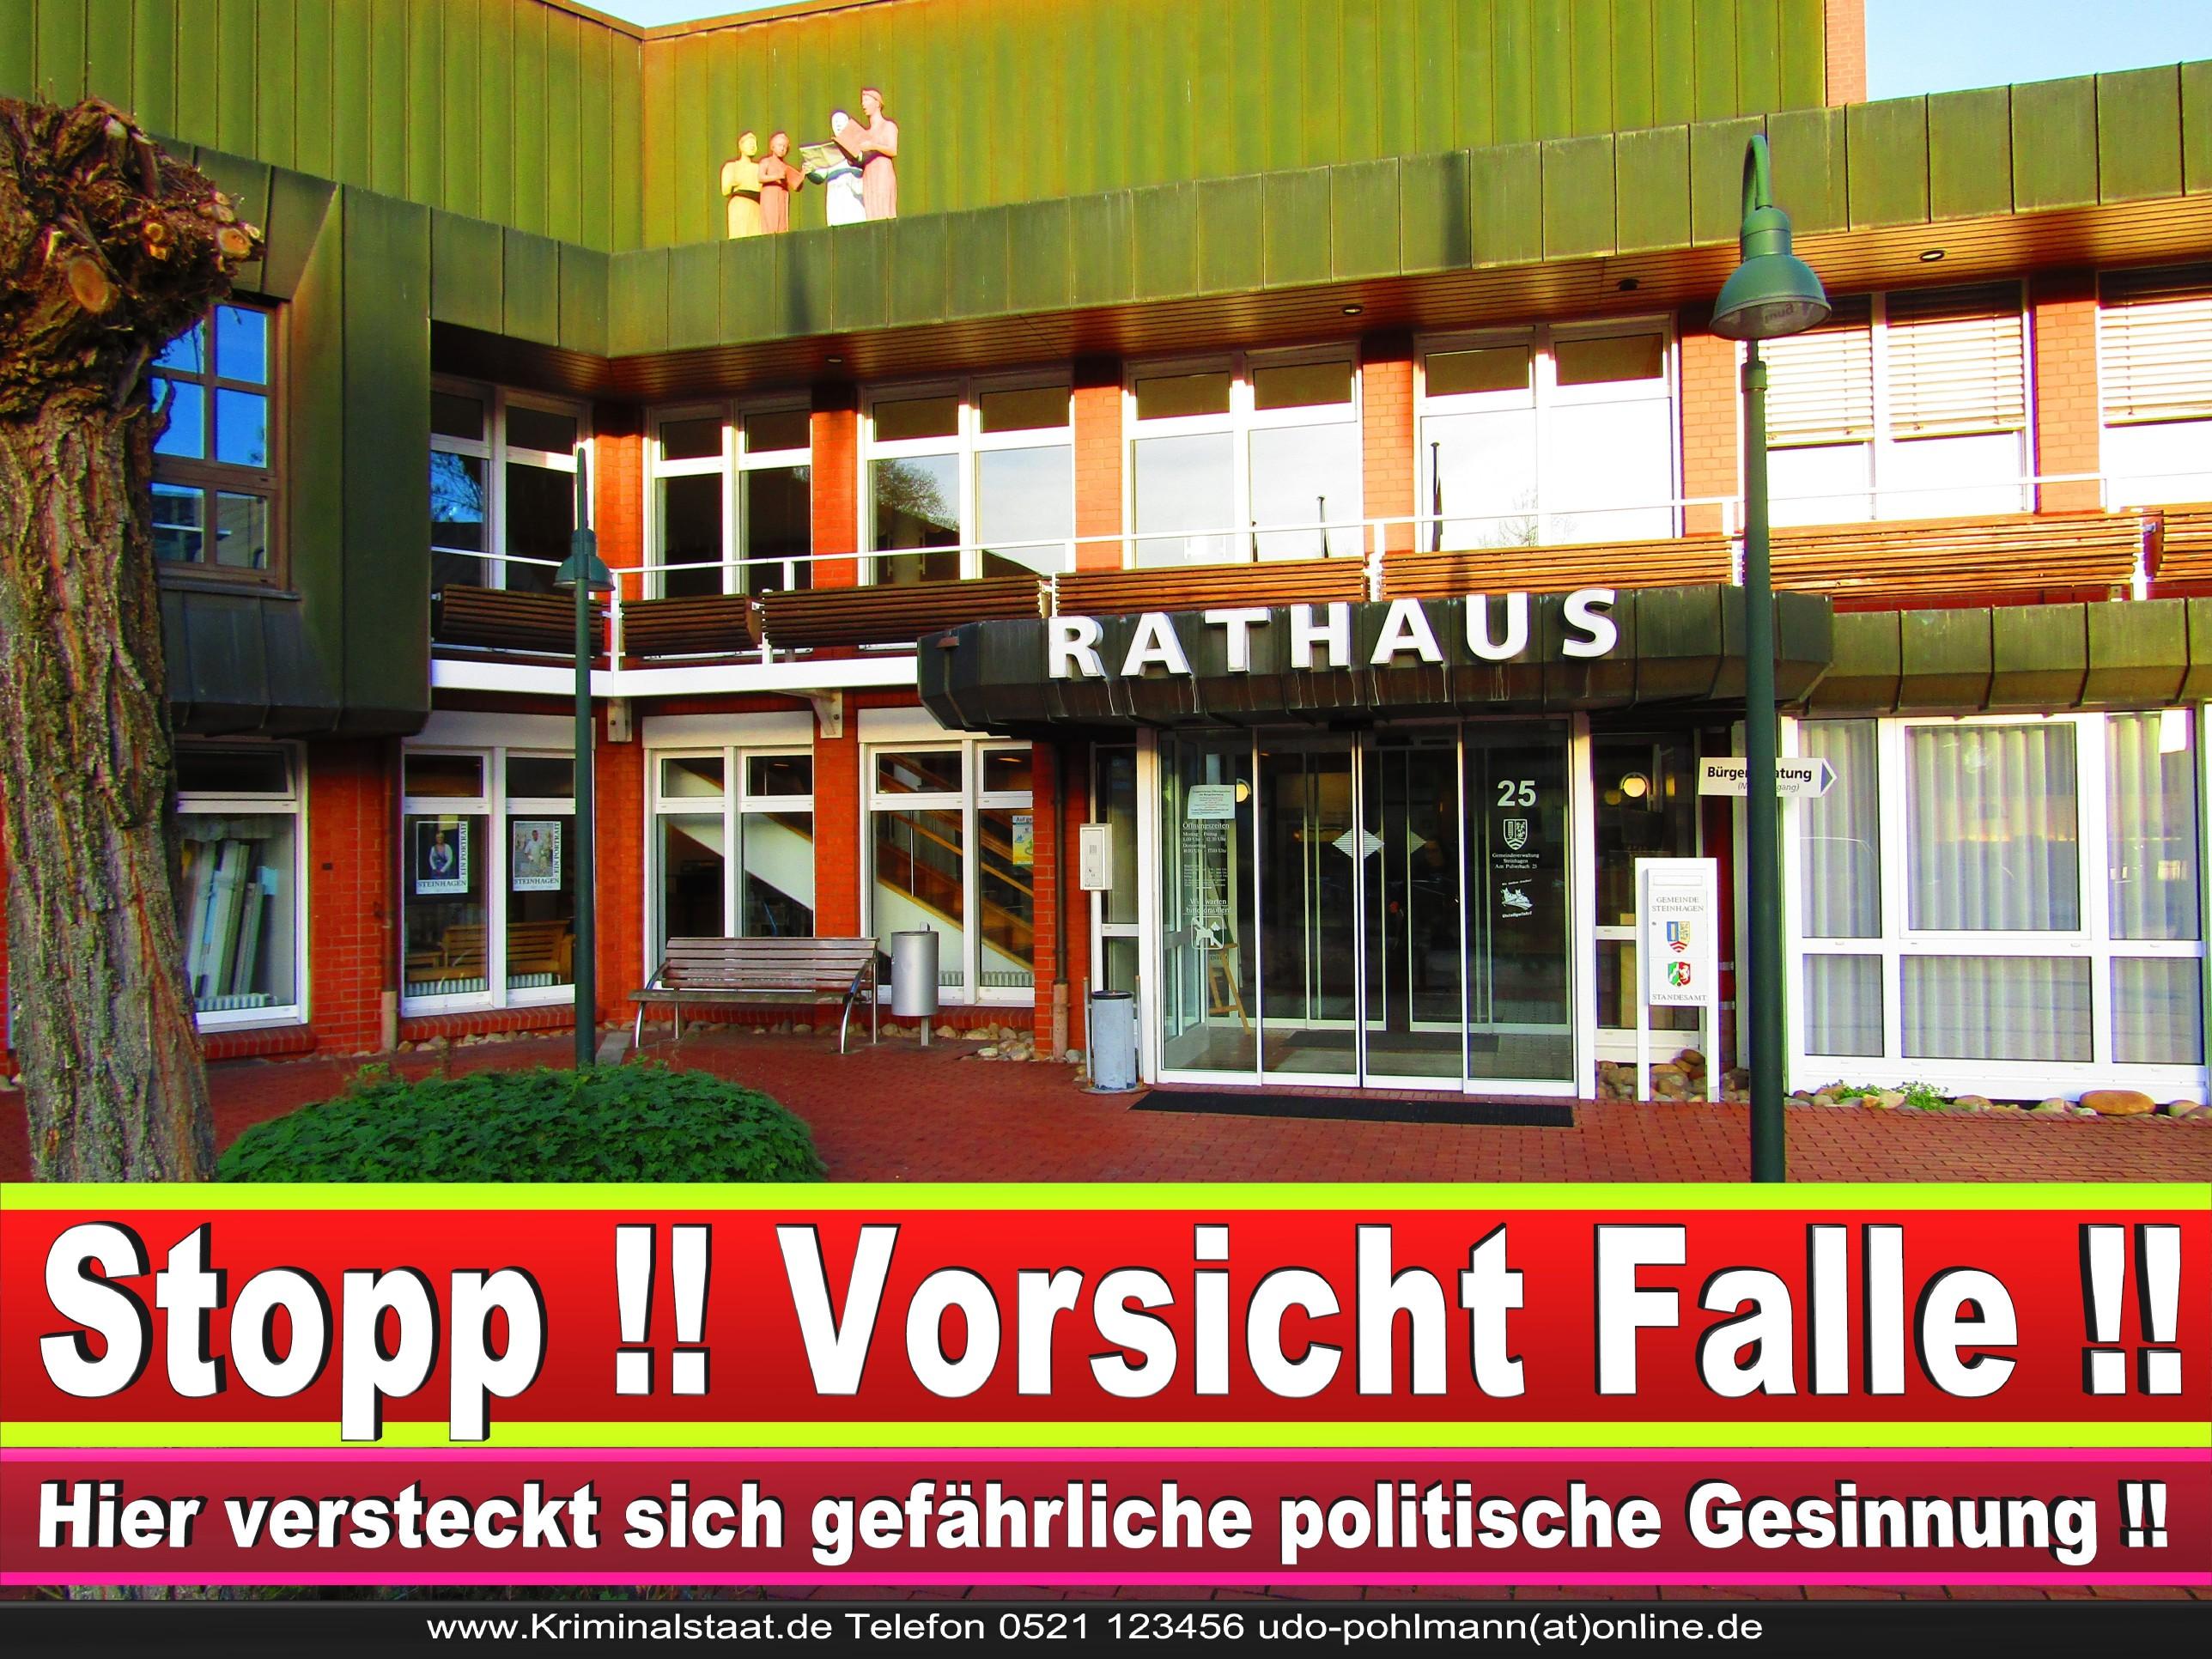 Rathaus Steinhagen CDU SPD FDP Ortsverband CDU Bürgerbüro CDU SPD Korruption Polizei Bürgermeister Karte Telefonbuch NRW OWL (14)